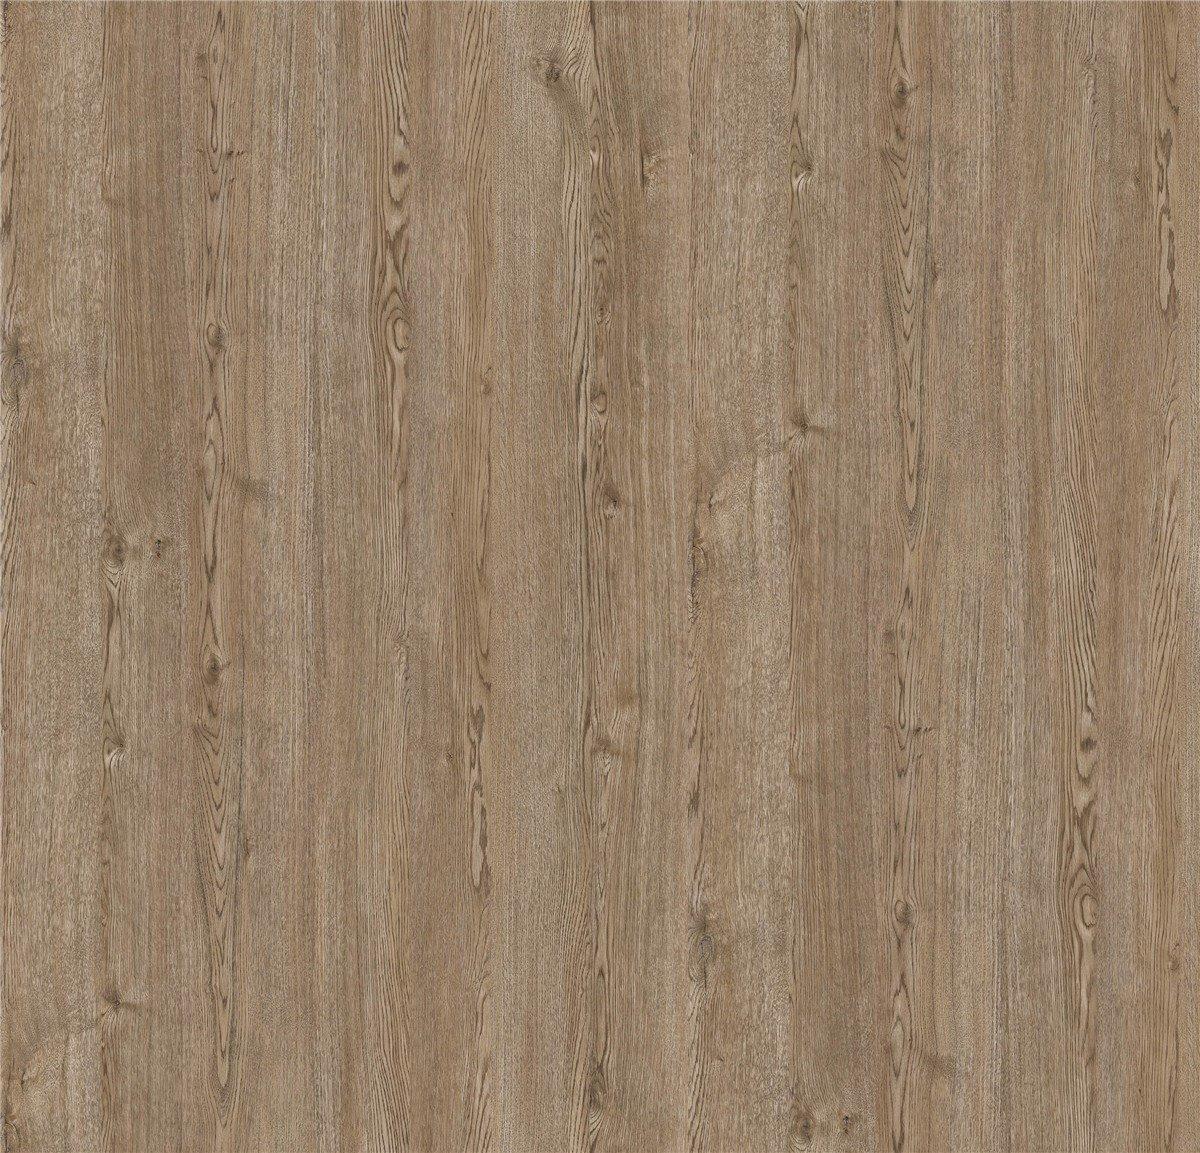 I.DECOR sturdy PU coated paper wood for master room-1